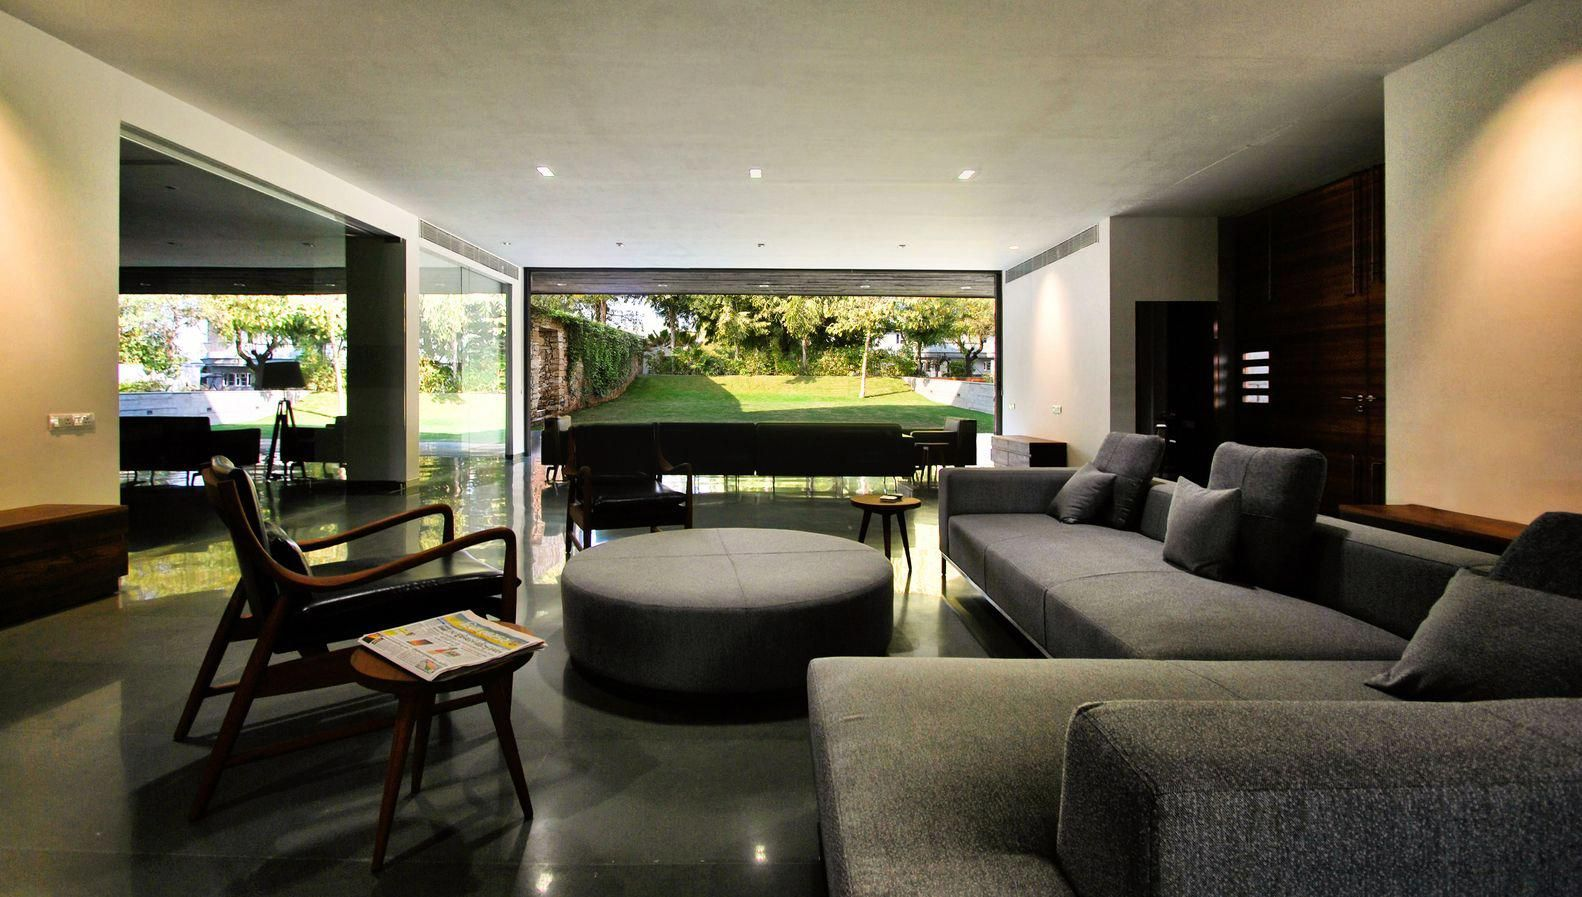 Photo harsh pandya panchkon sweet home make interior decoration design ideas decor styles also rh pinterest